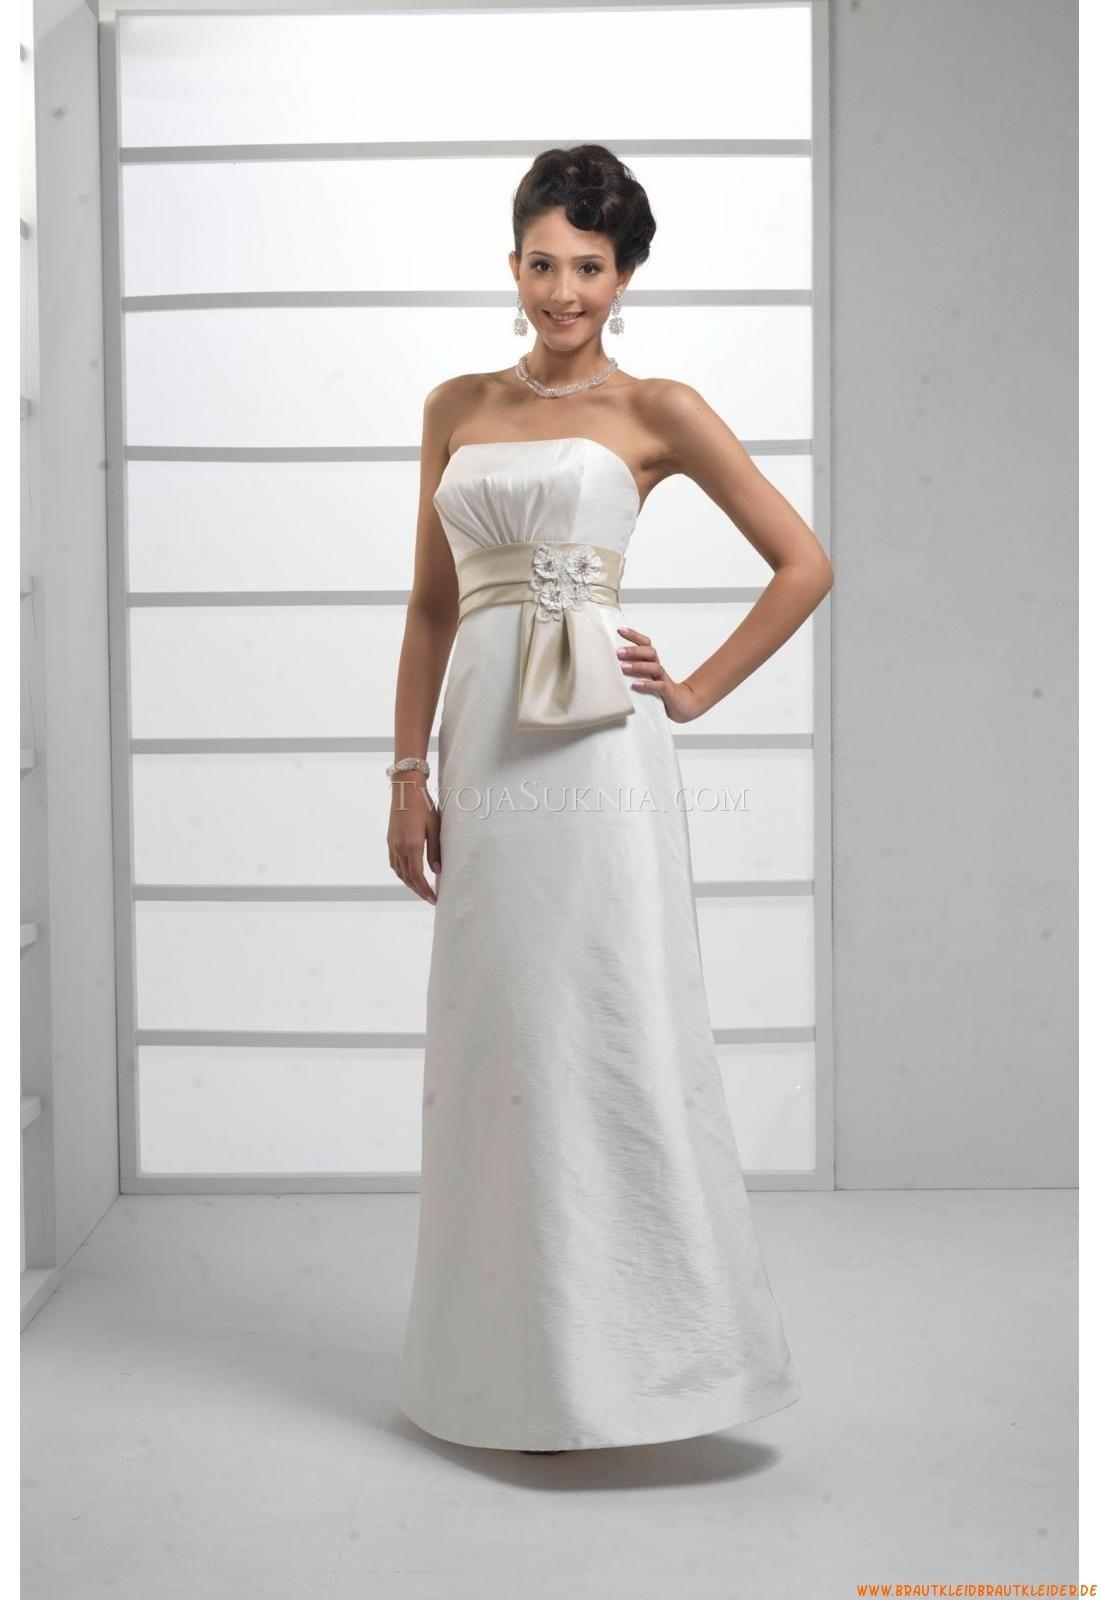 Knielang Günstige Brautkleider | inexpensive wedding dresses ...